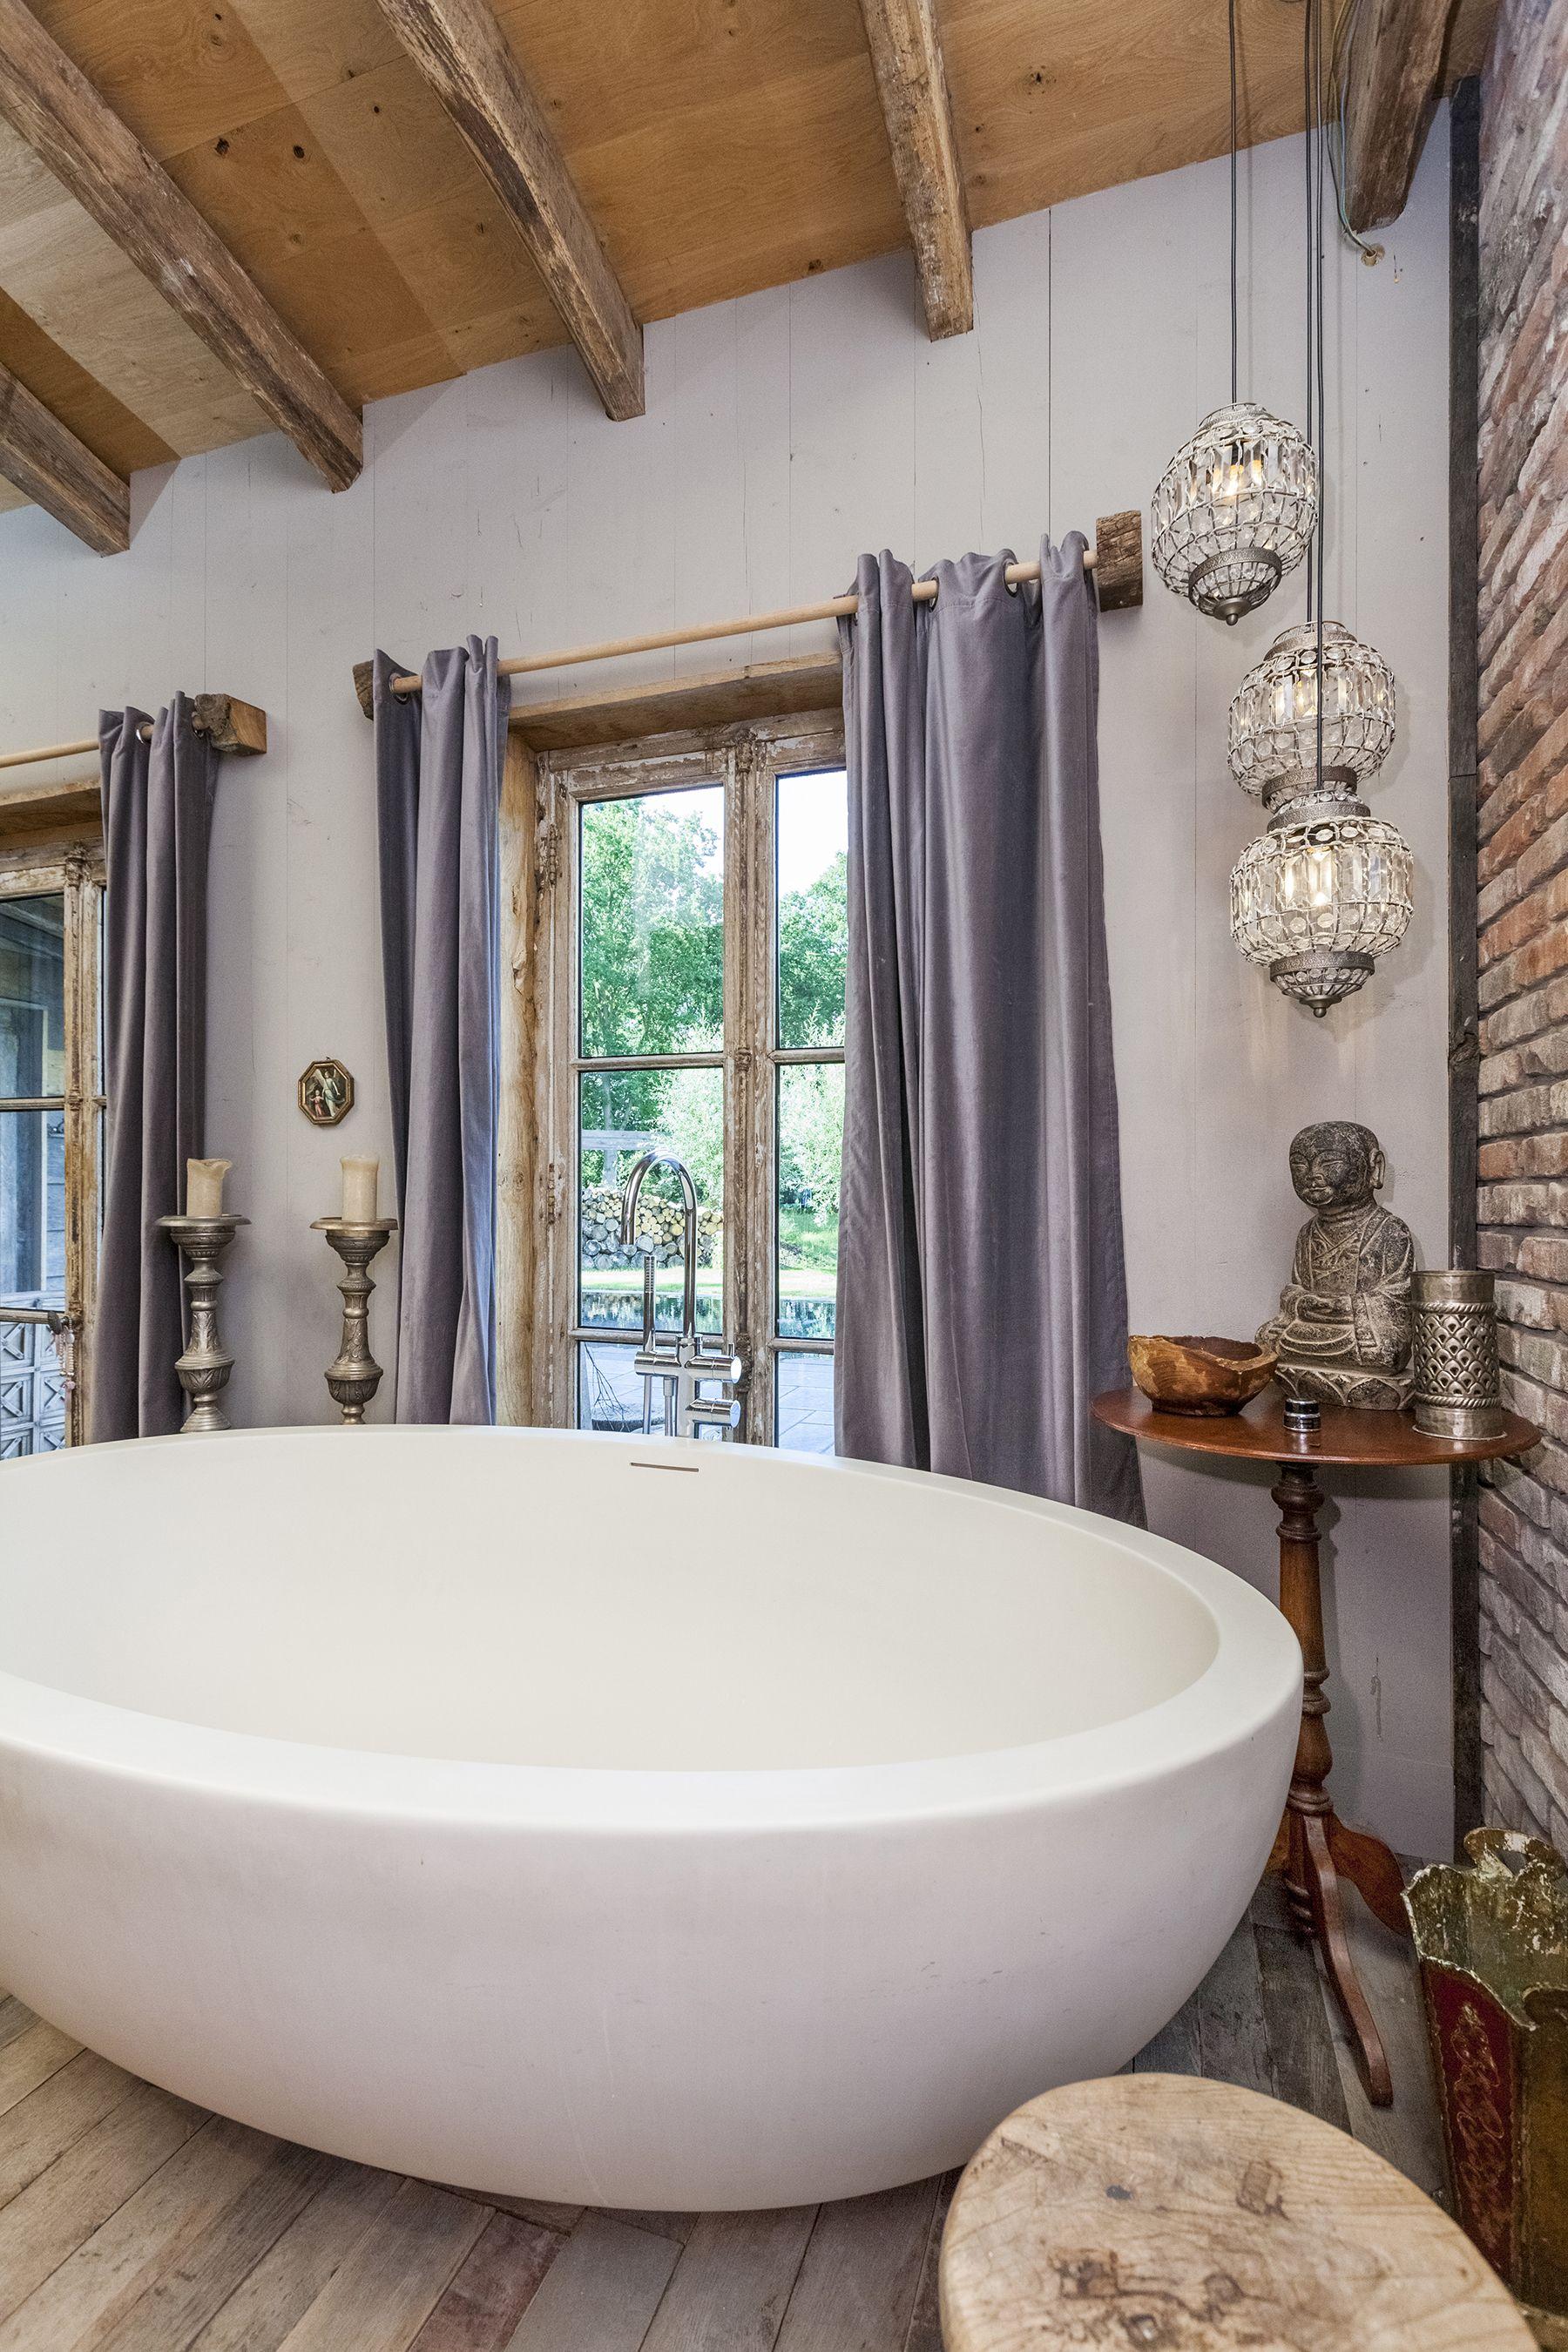 Big. Bigger. Biggest. #bath #bathtub #Realestate #Photography ...